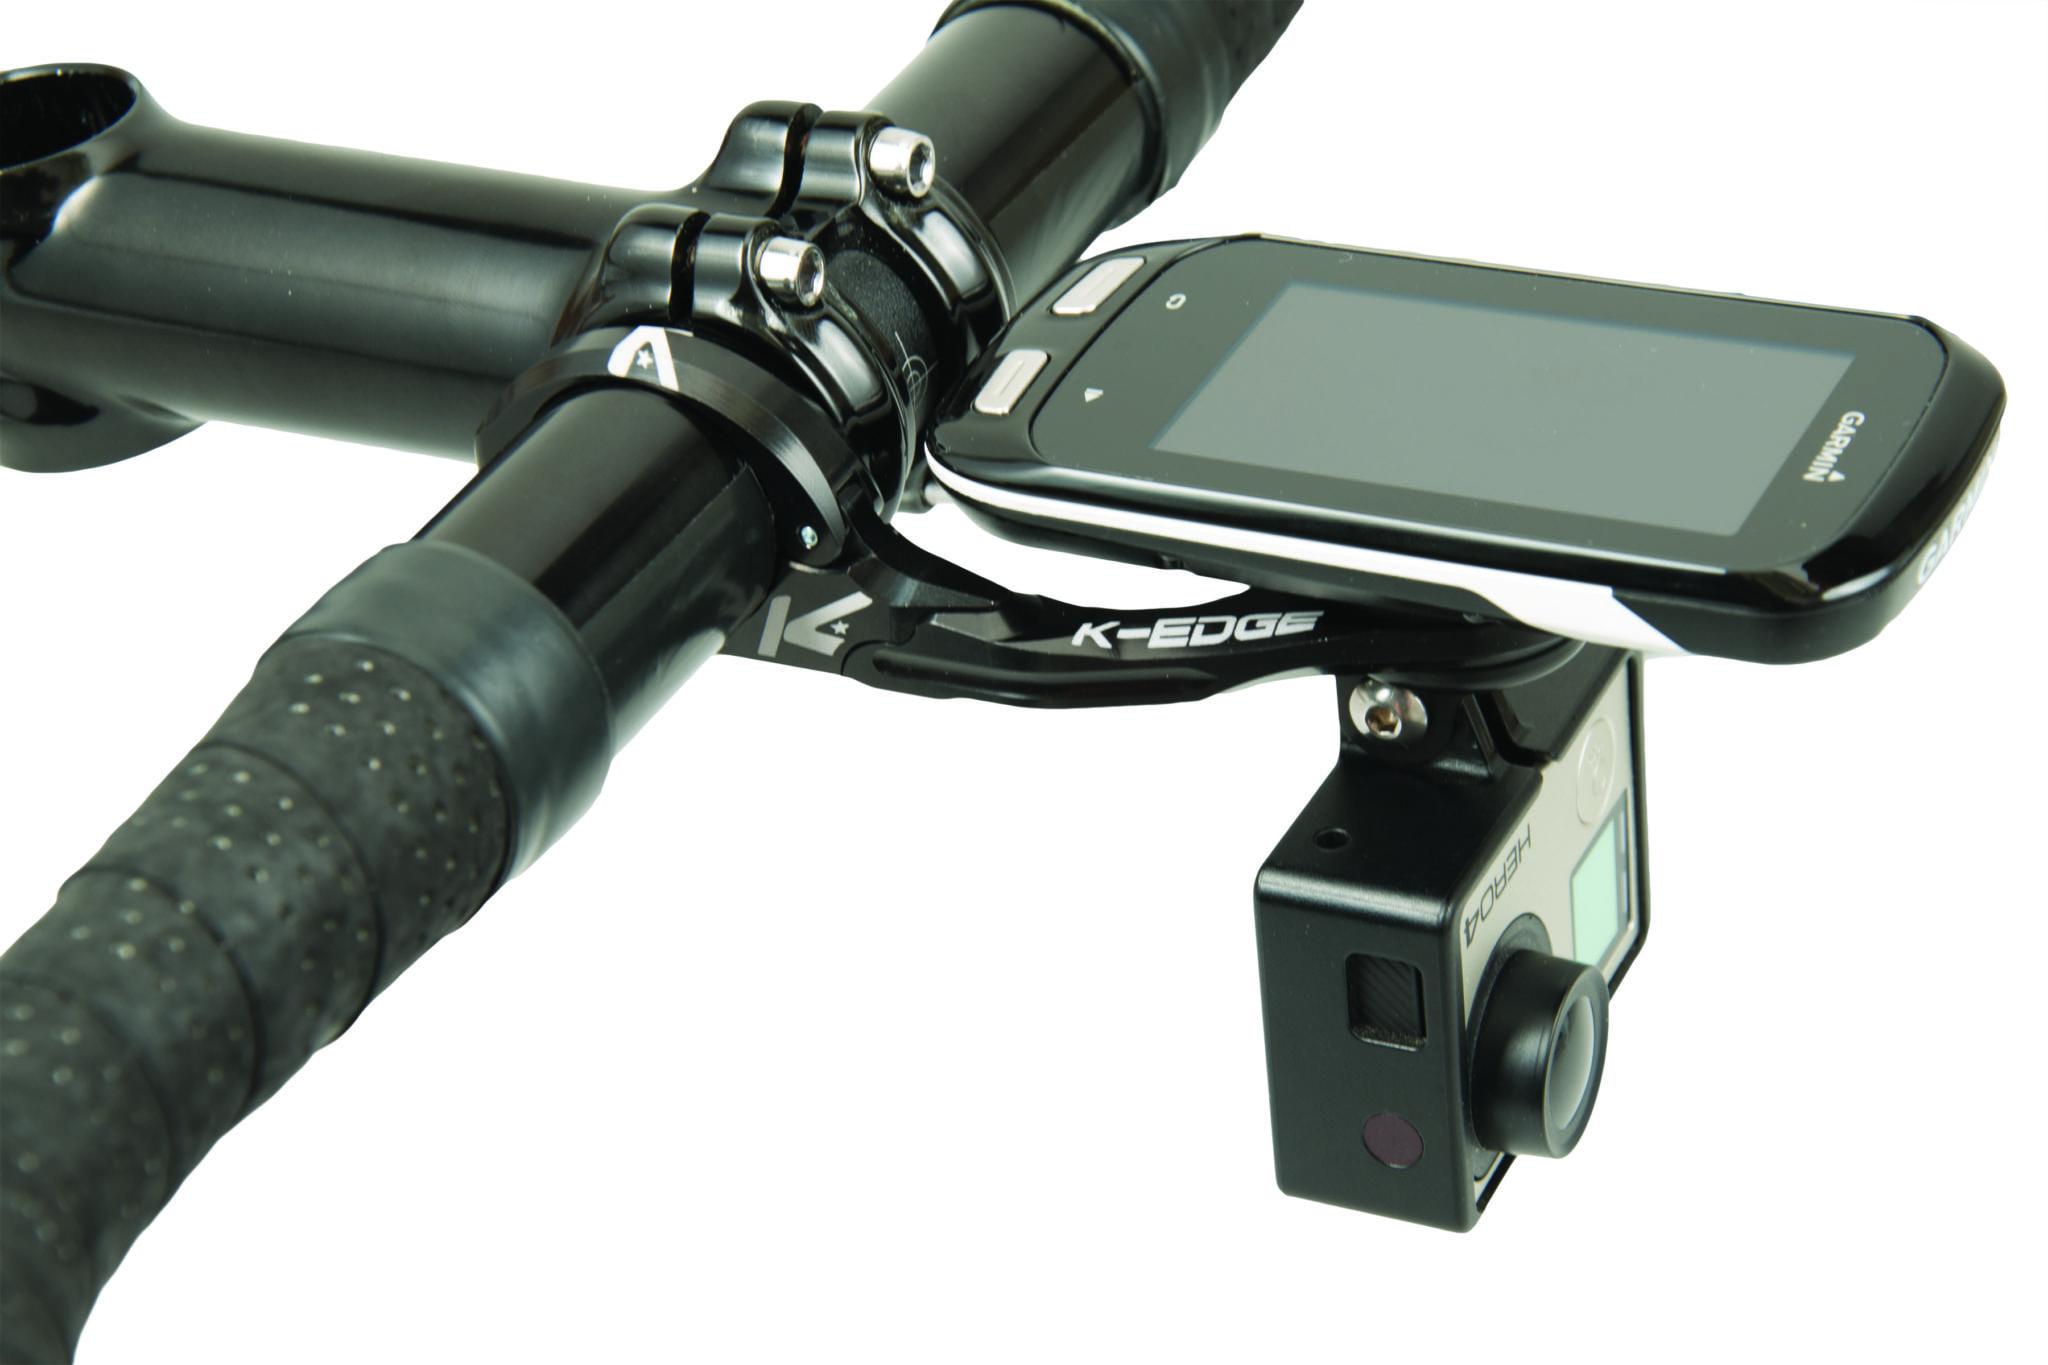 CNC Bike Bicycle Handlebar Mount for Garmin Edge Cycle Computer Gopro Holder